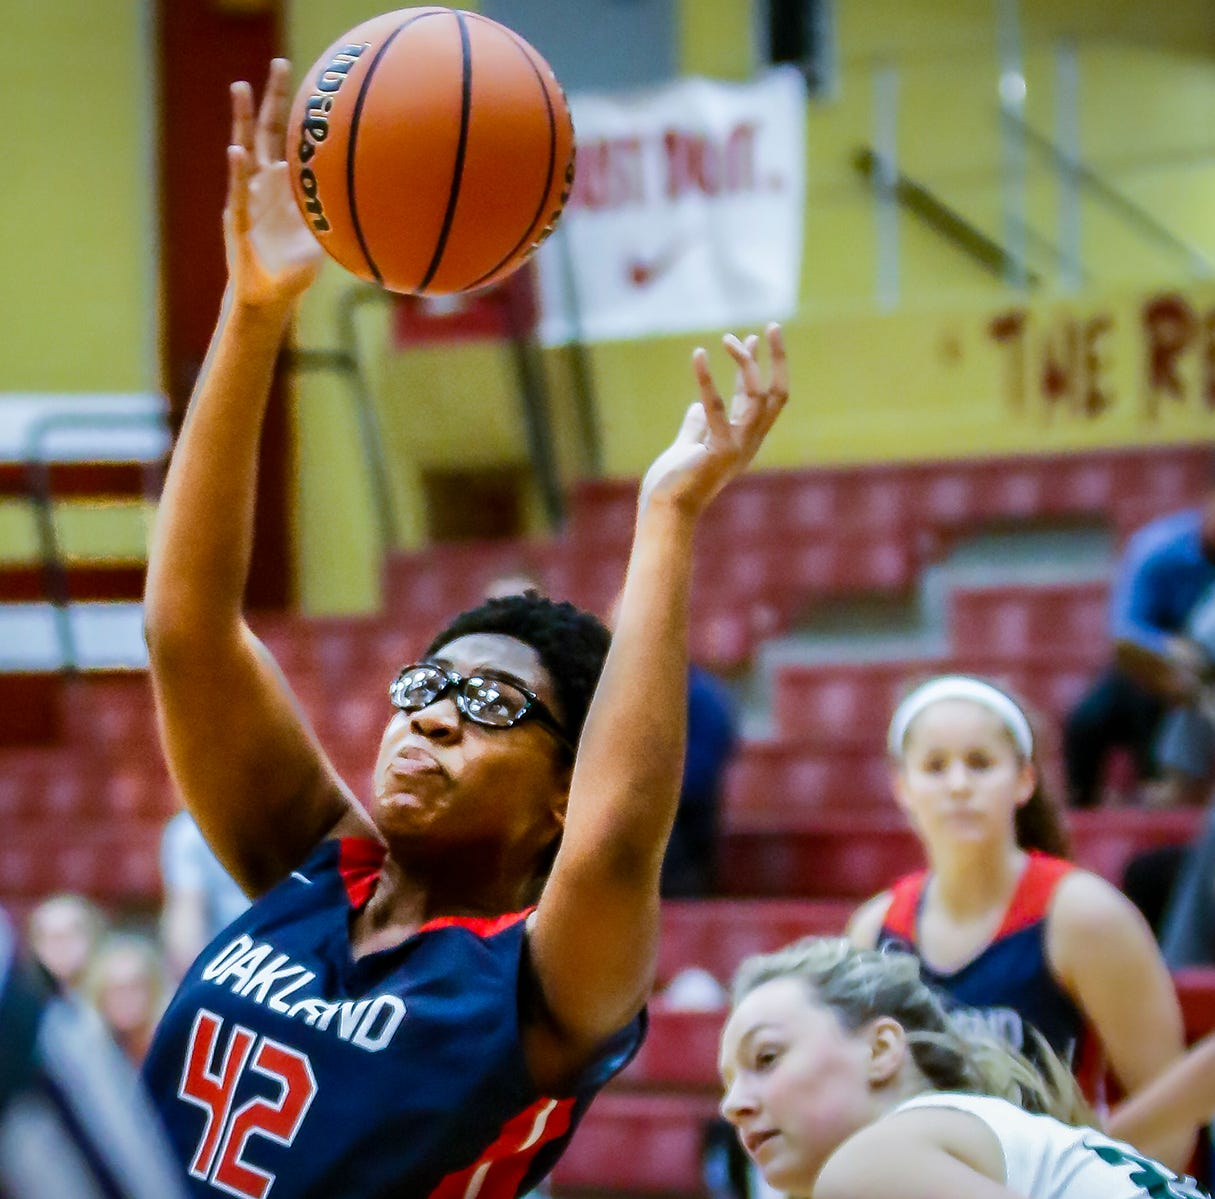 Tuesday's Murfreesboro area high school basketball top performers